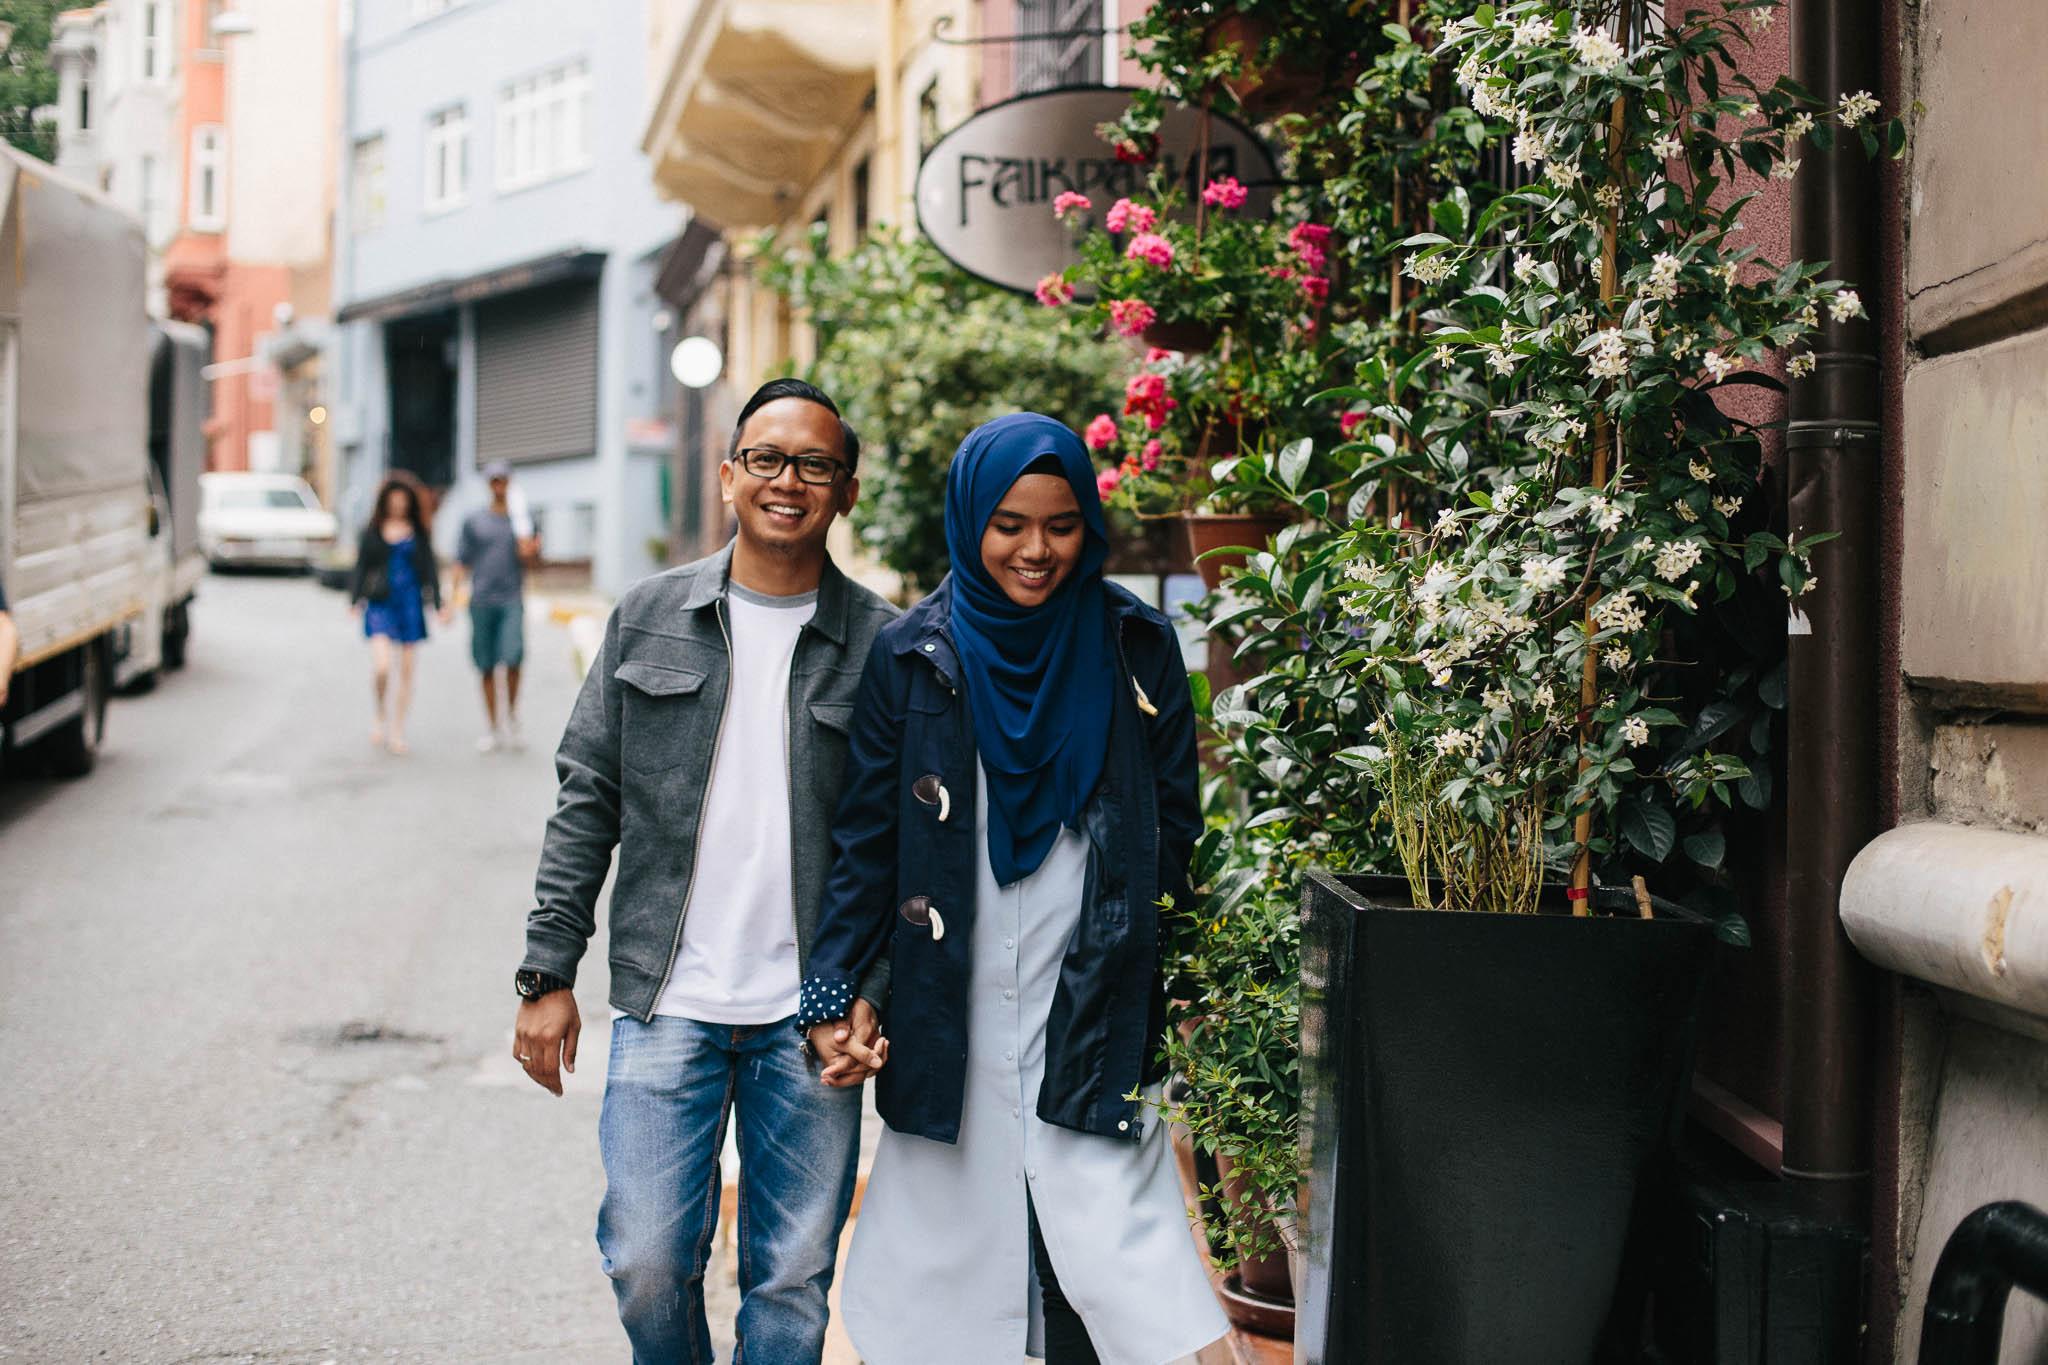 singapore-wedding-photographer-dzul-isma-istanbul-38.jpg